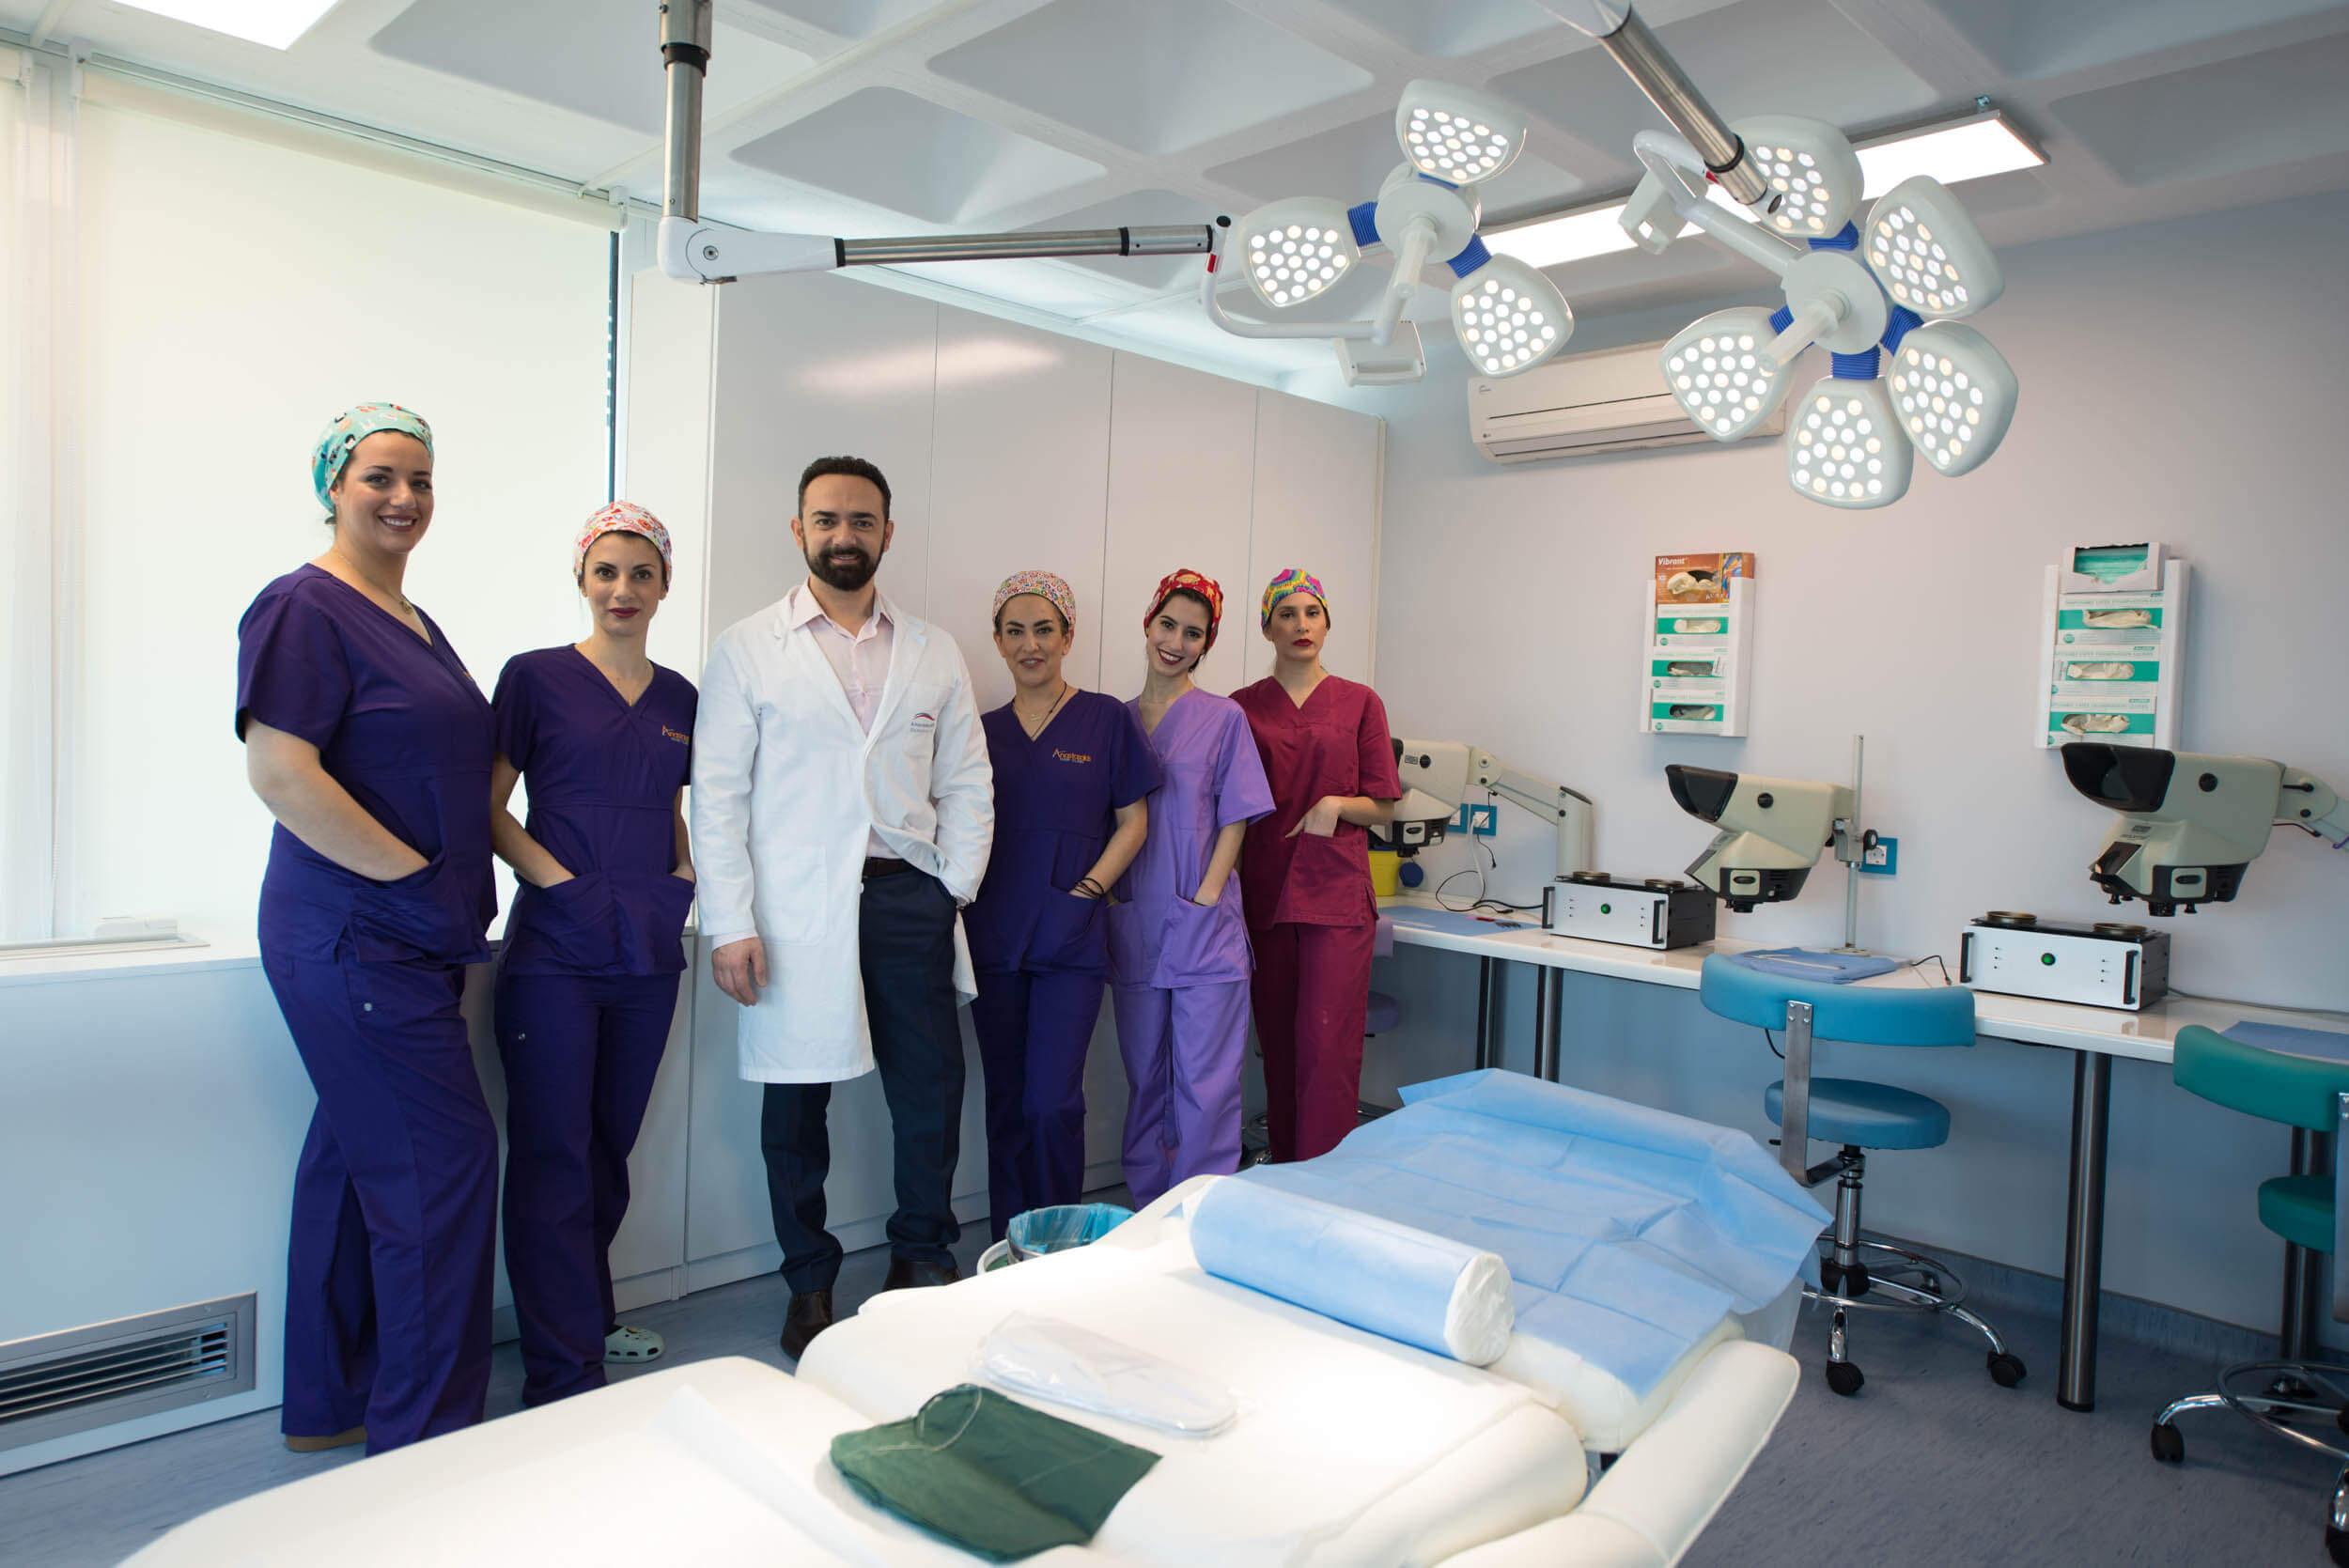 Nοσηλευτικό προσωπικό μεταμόσχευσης μαλλιών Anastasakis Hair Clinic 2